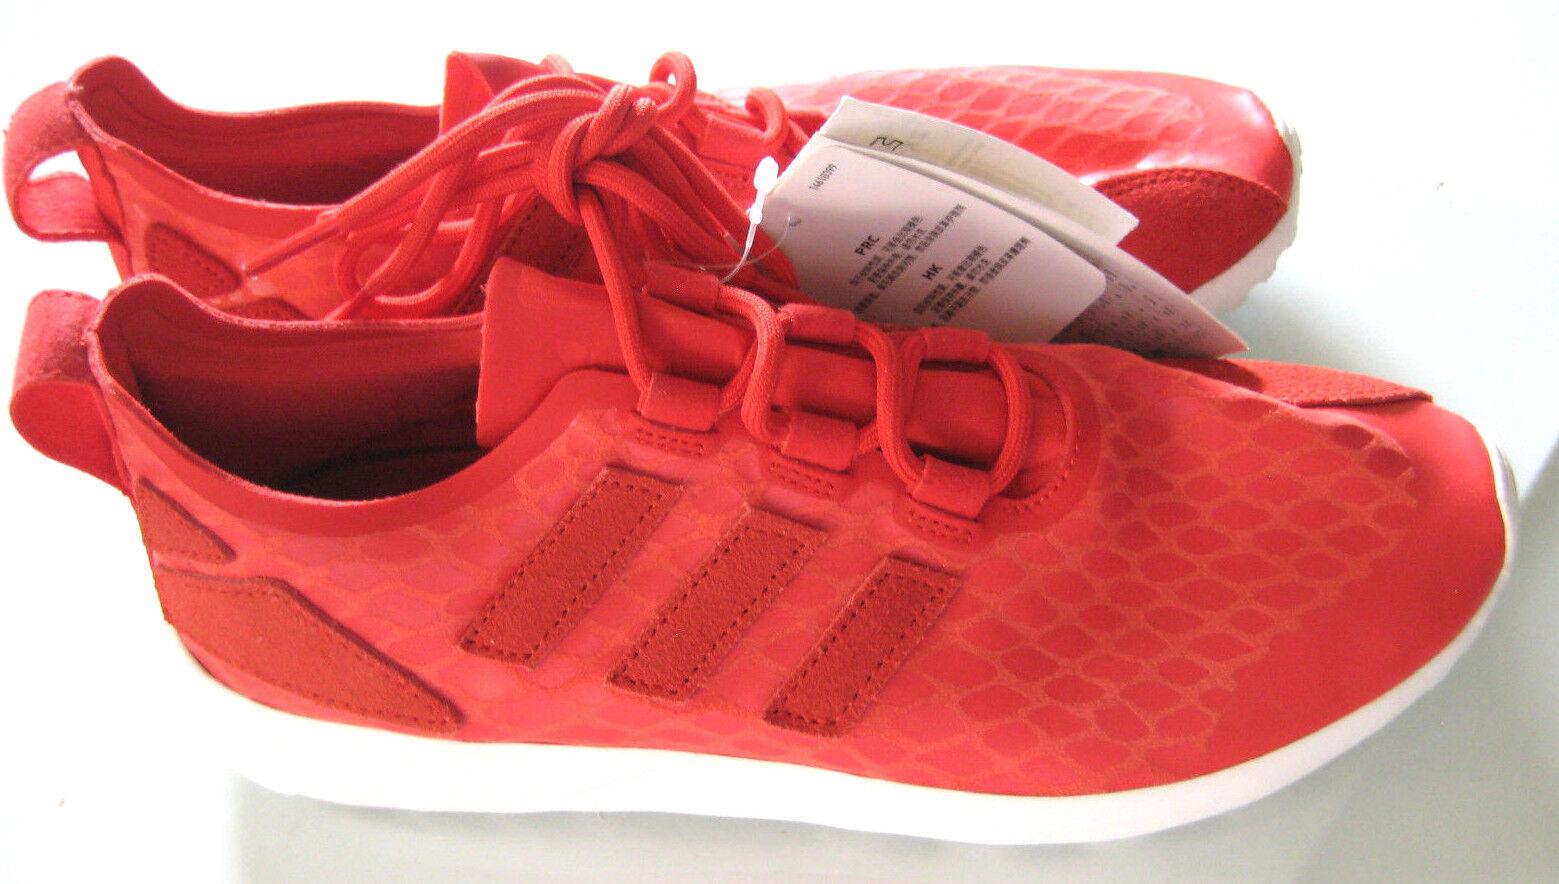 Adidas Sneaker Zx Flux Adv Test Vergleich +++ Adidas Sneaker